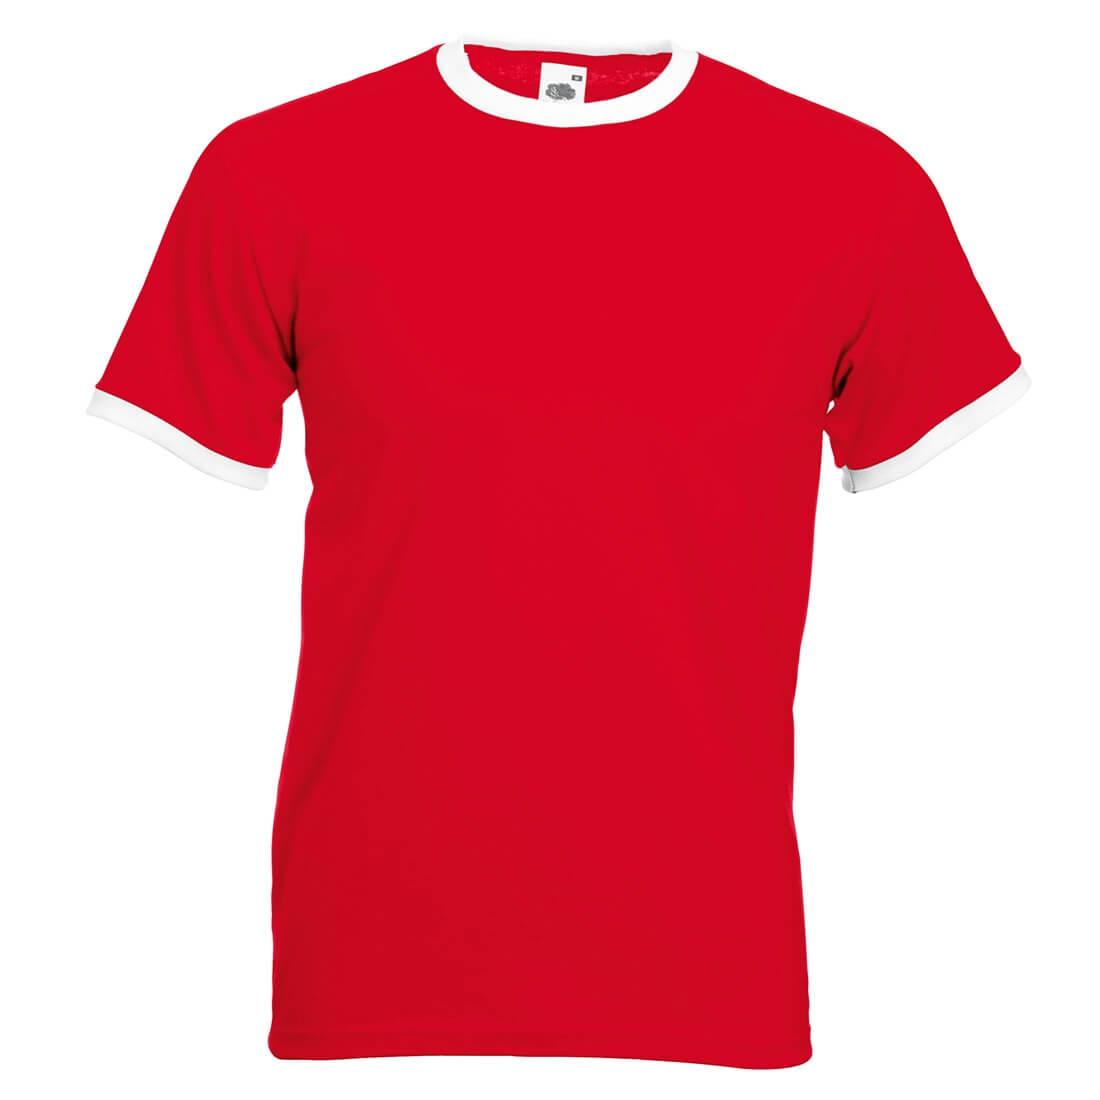 Tricou Ringer - Imbracaminte de protectie